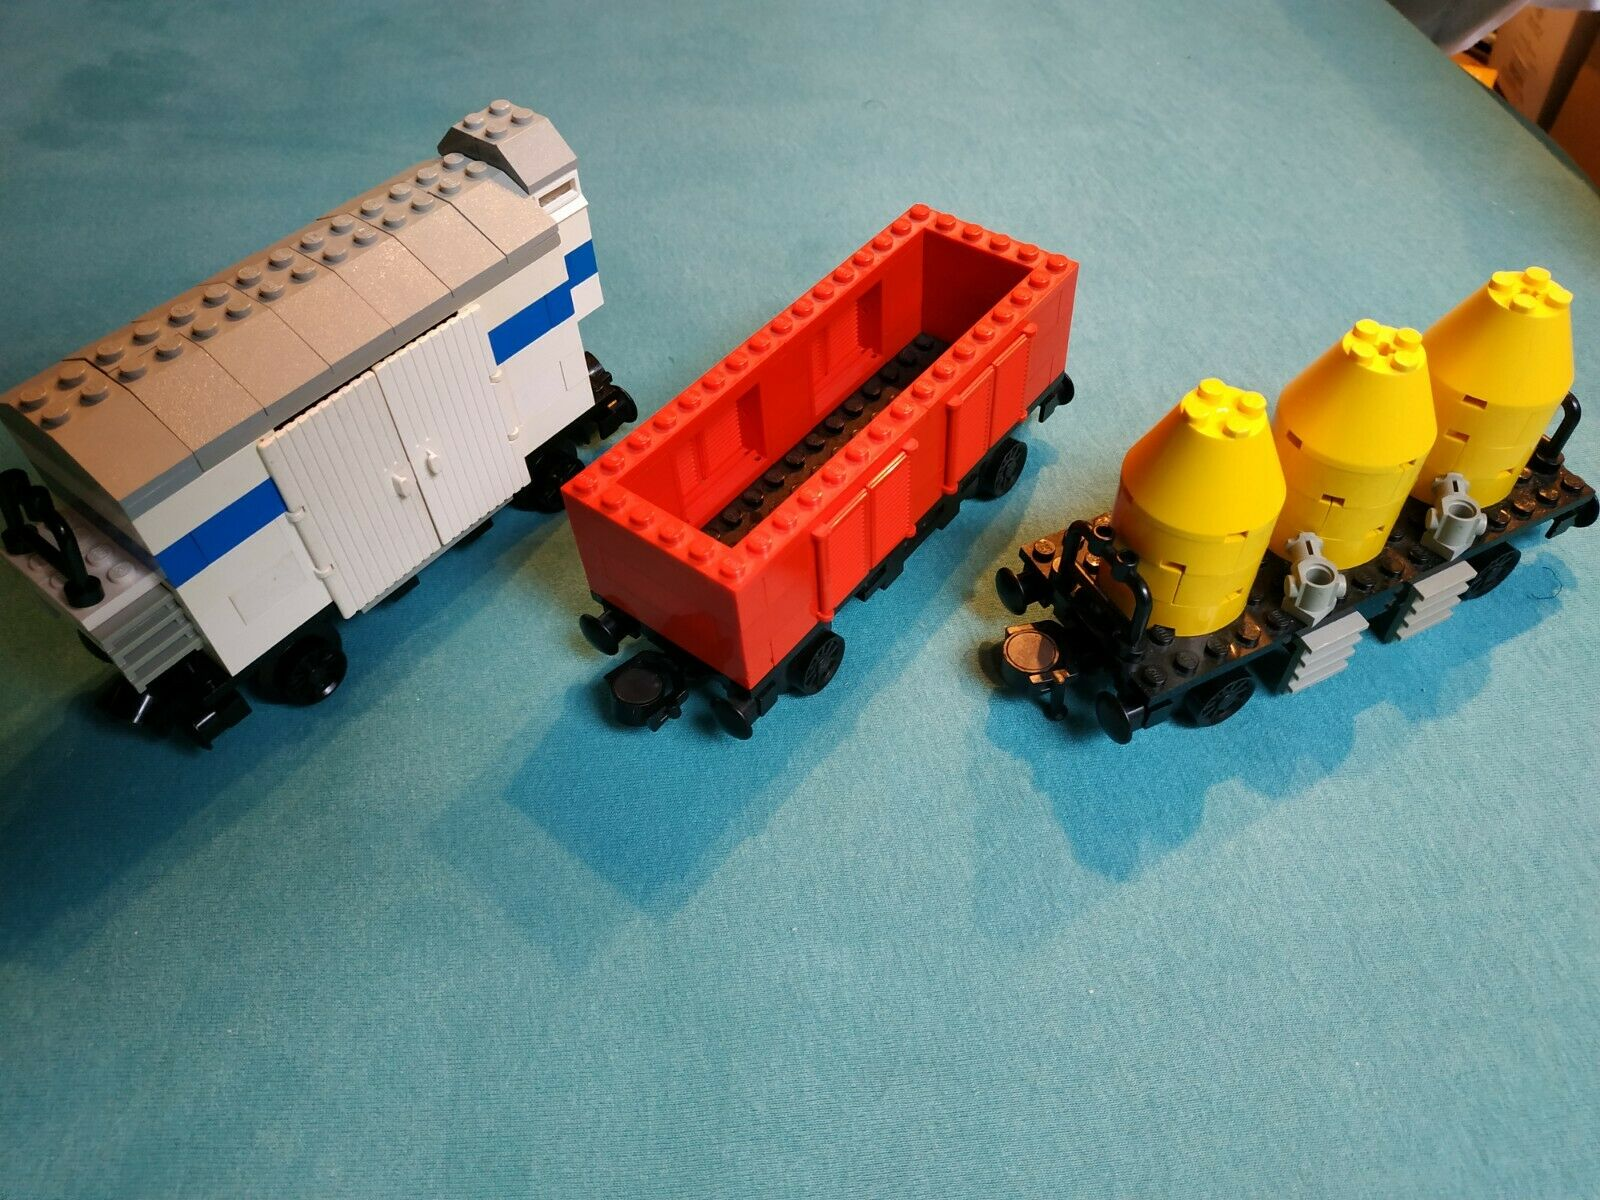 3 Lego Waggons aus Legoset 7730, gebraucht